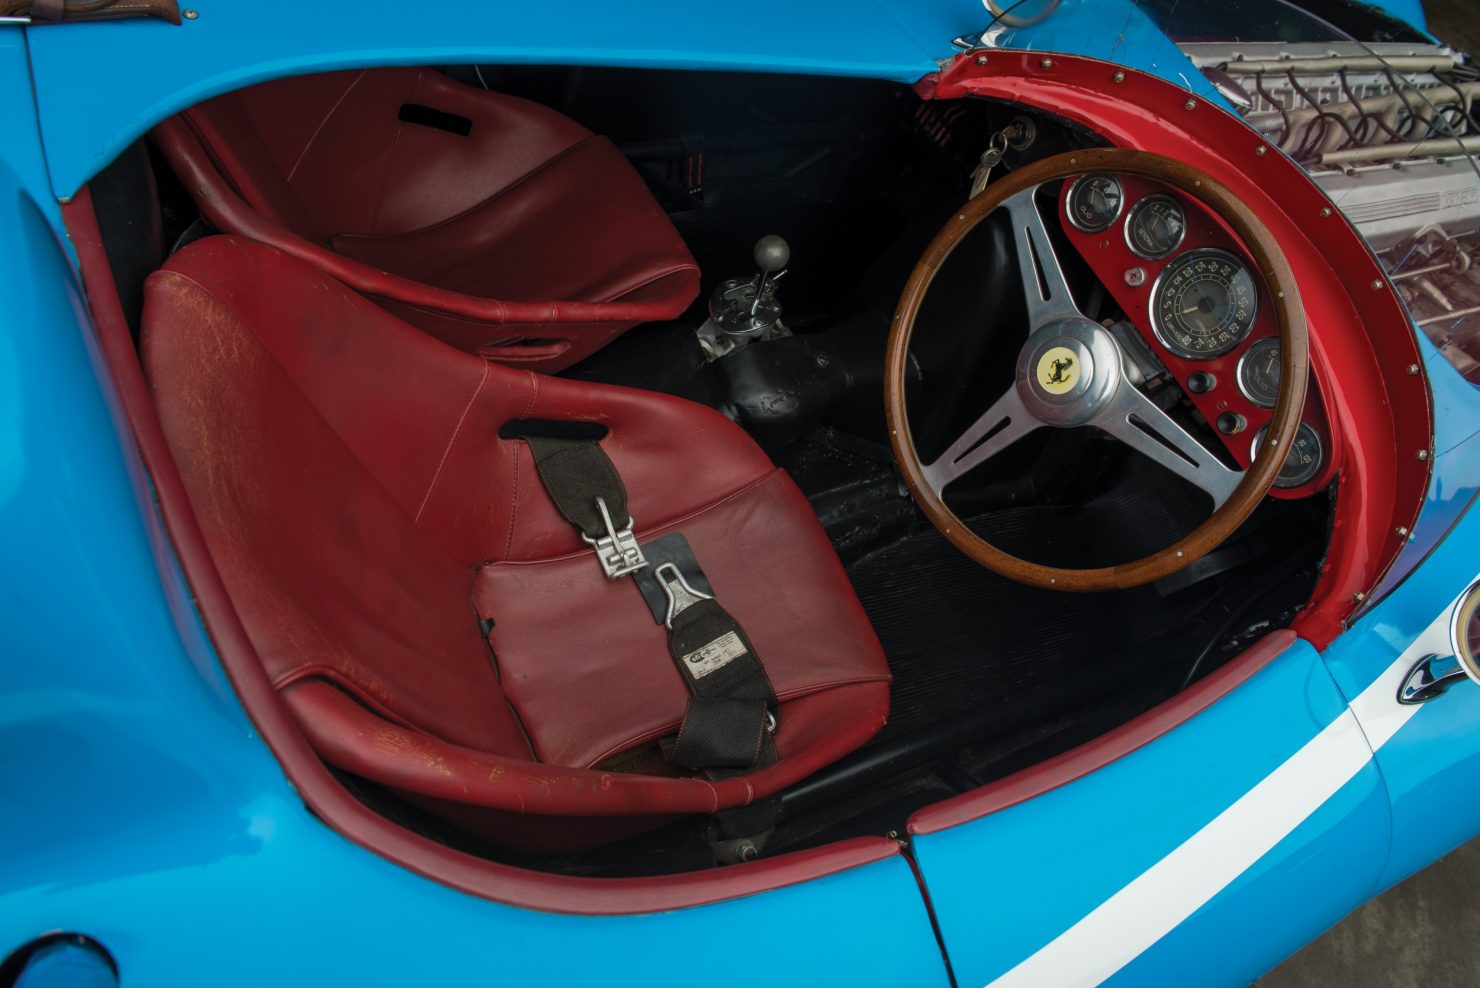 ferrari 121 lm spider 4 1480x988 - 1955 Ferrari 121 LM